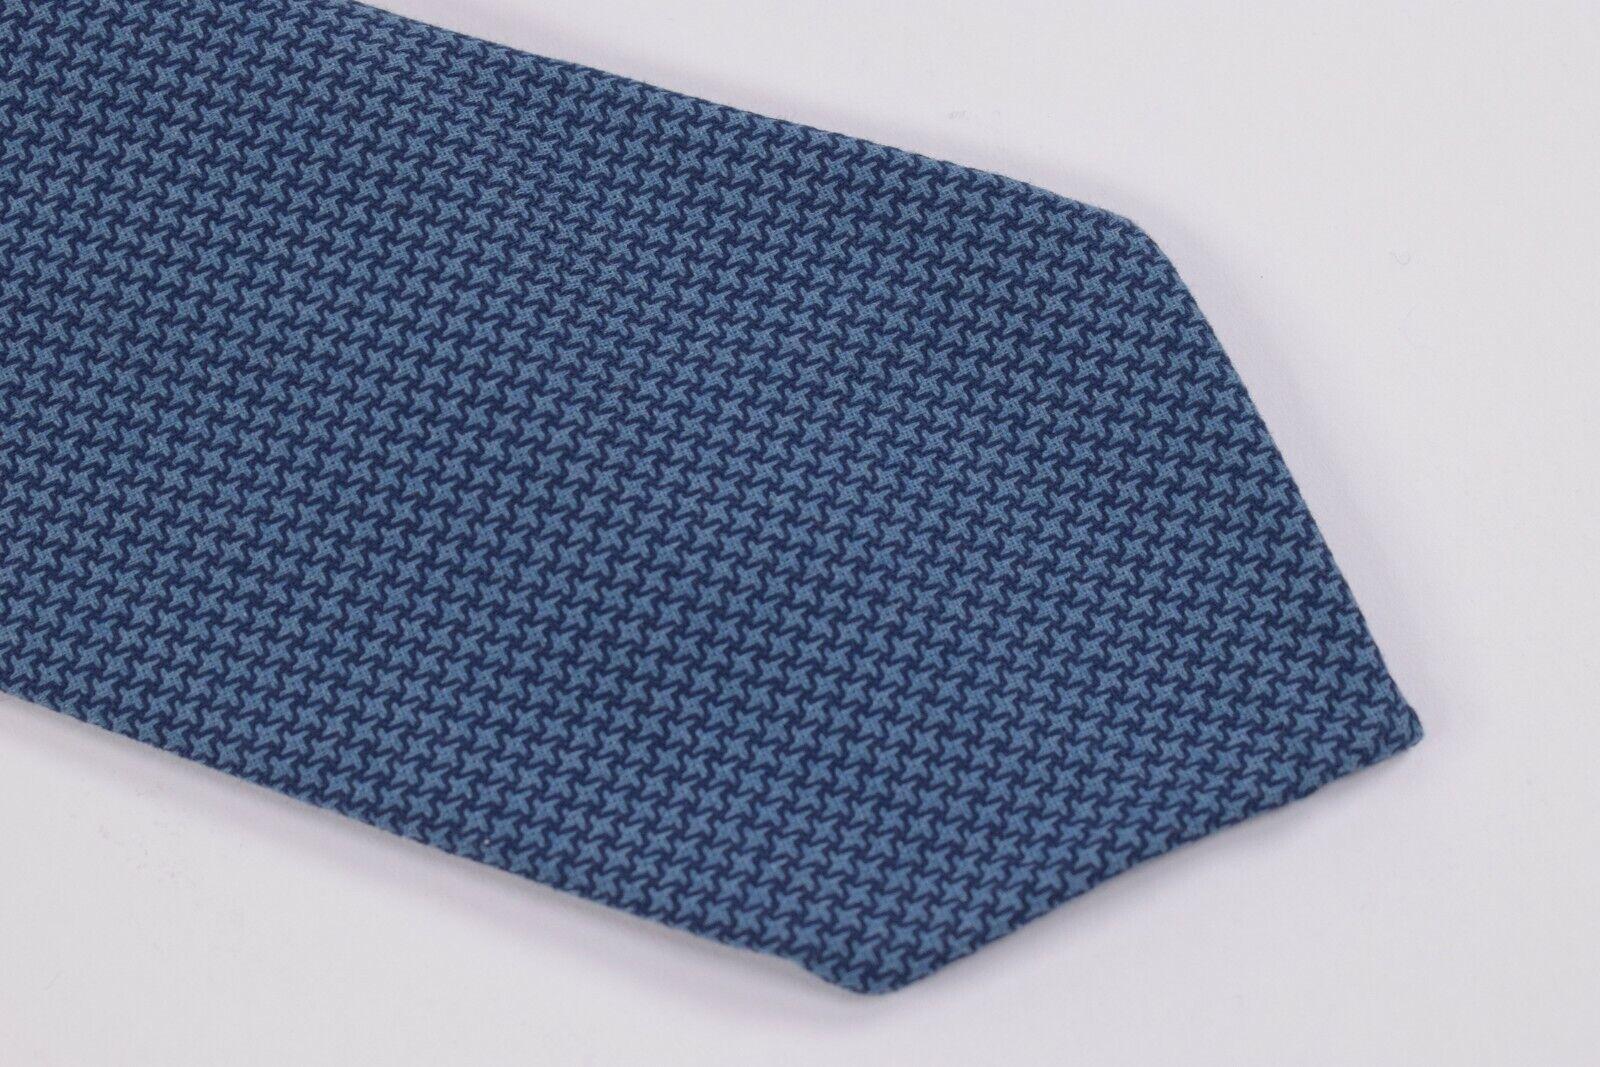 Belvest Neck Tie NWT Blue Houndstooth Cotton Blend